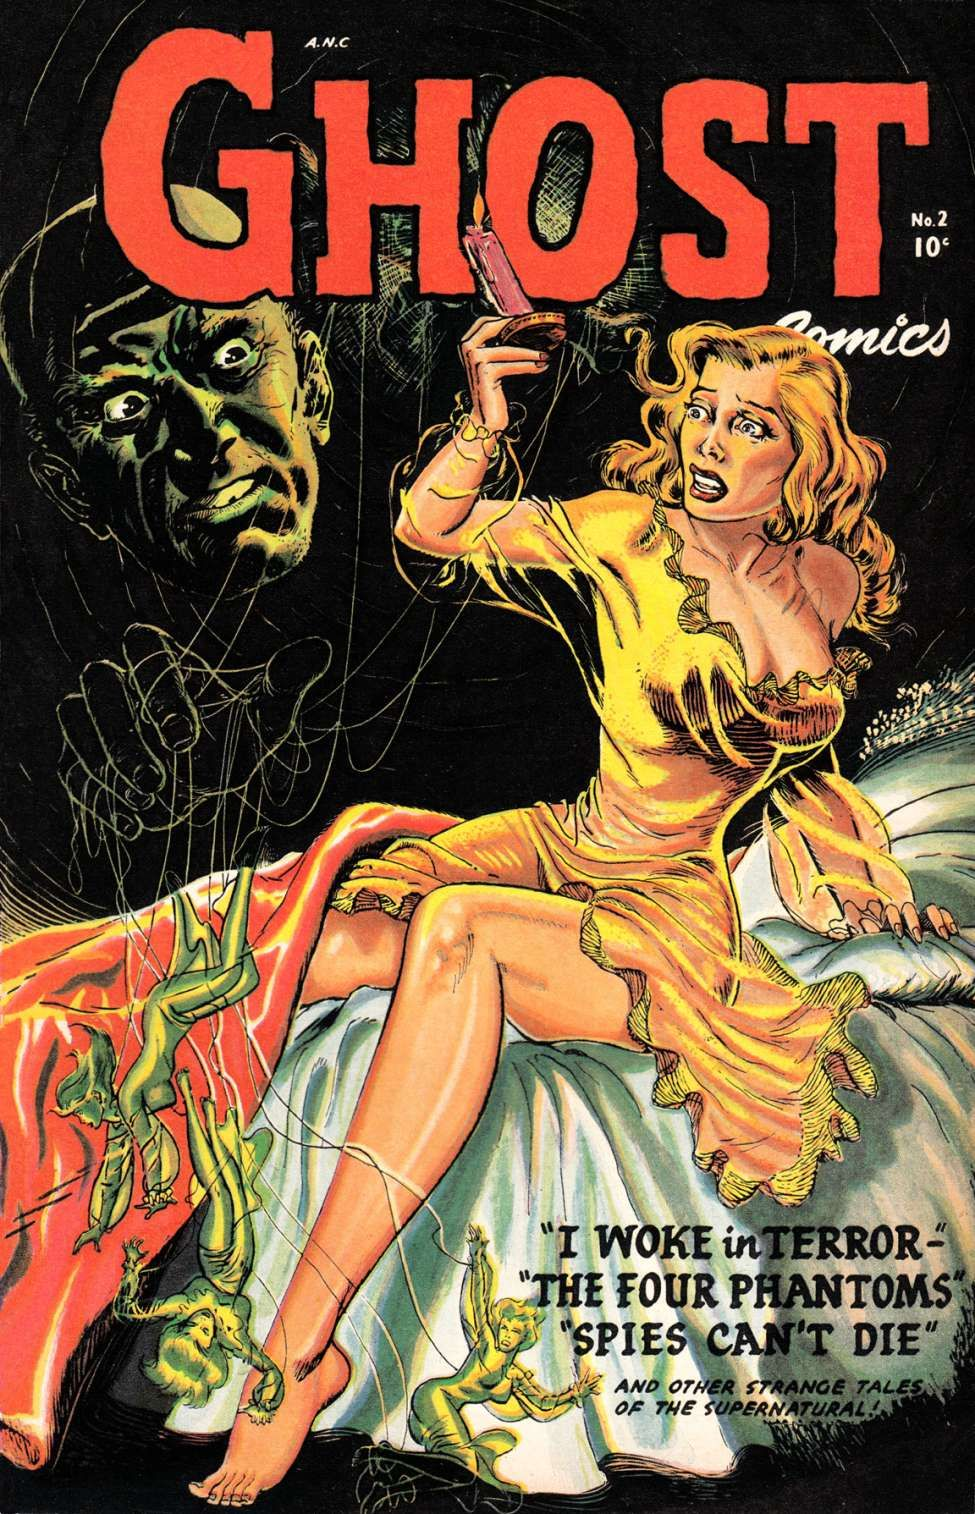 Book Cover Portadas Historicas ~ Comic book cover for ghost comics horror and